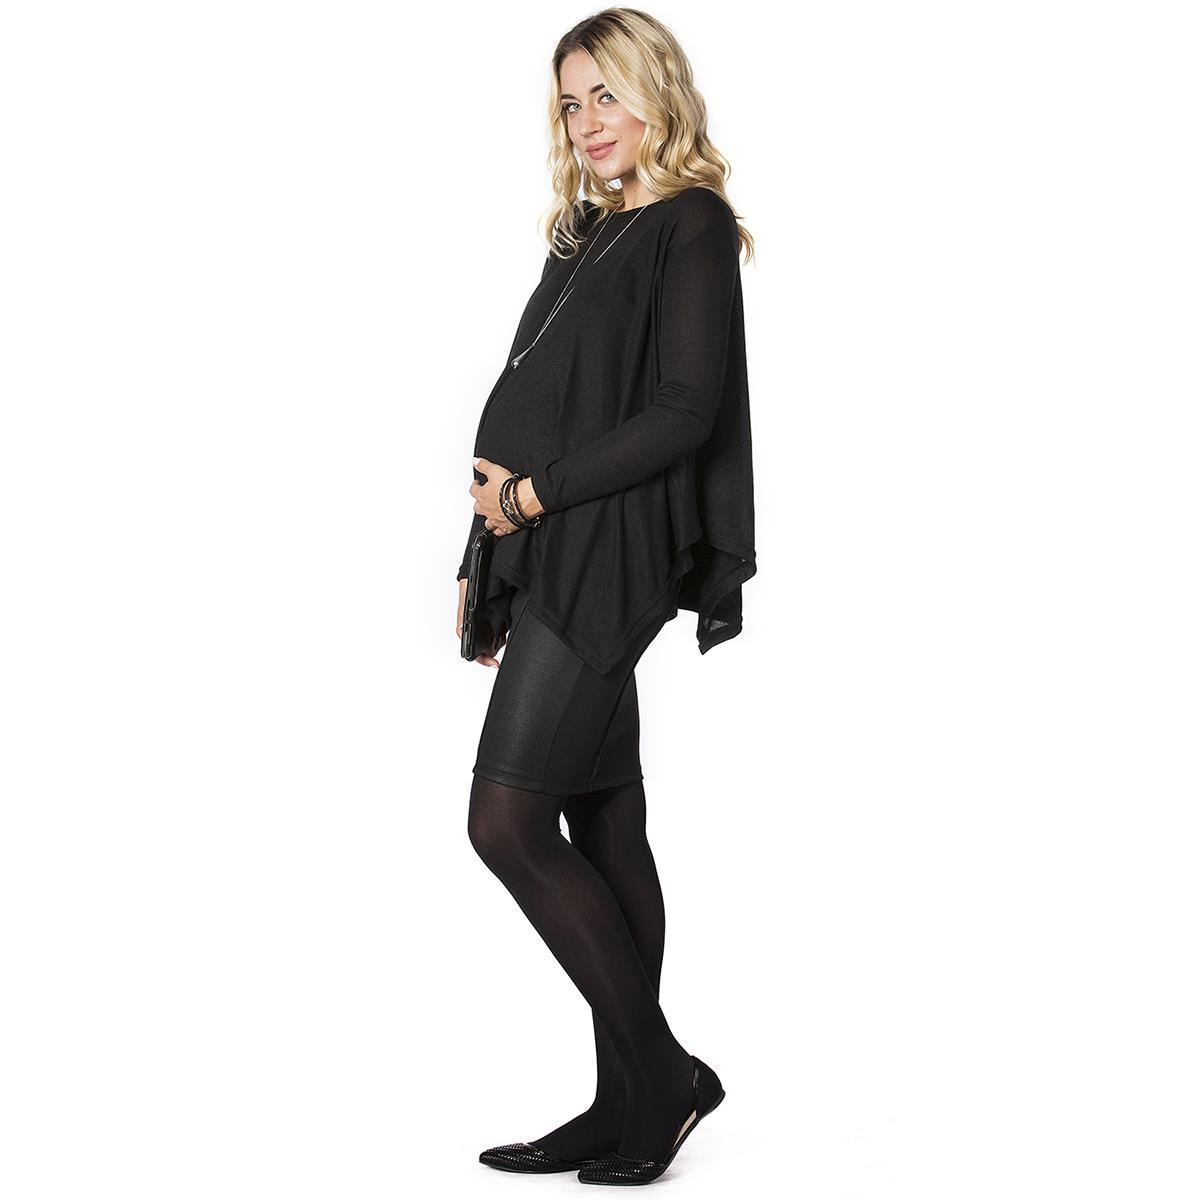 LYN Devon Pregnant Black Pencil Skirt